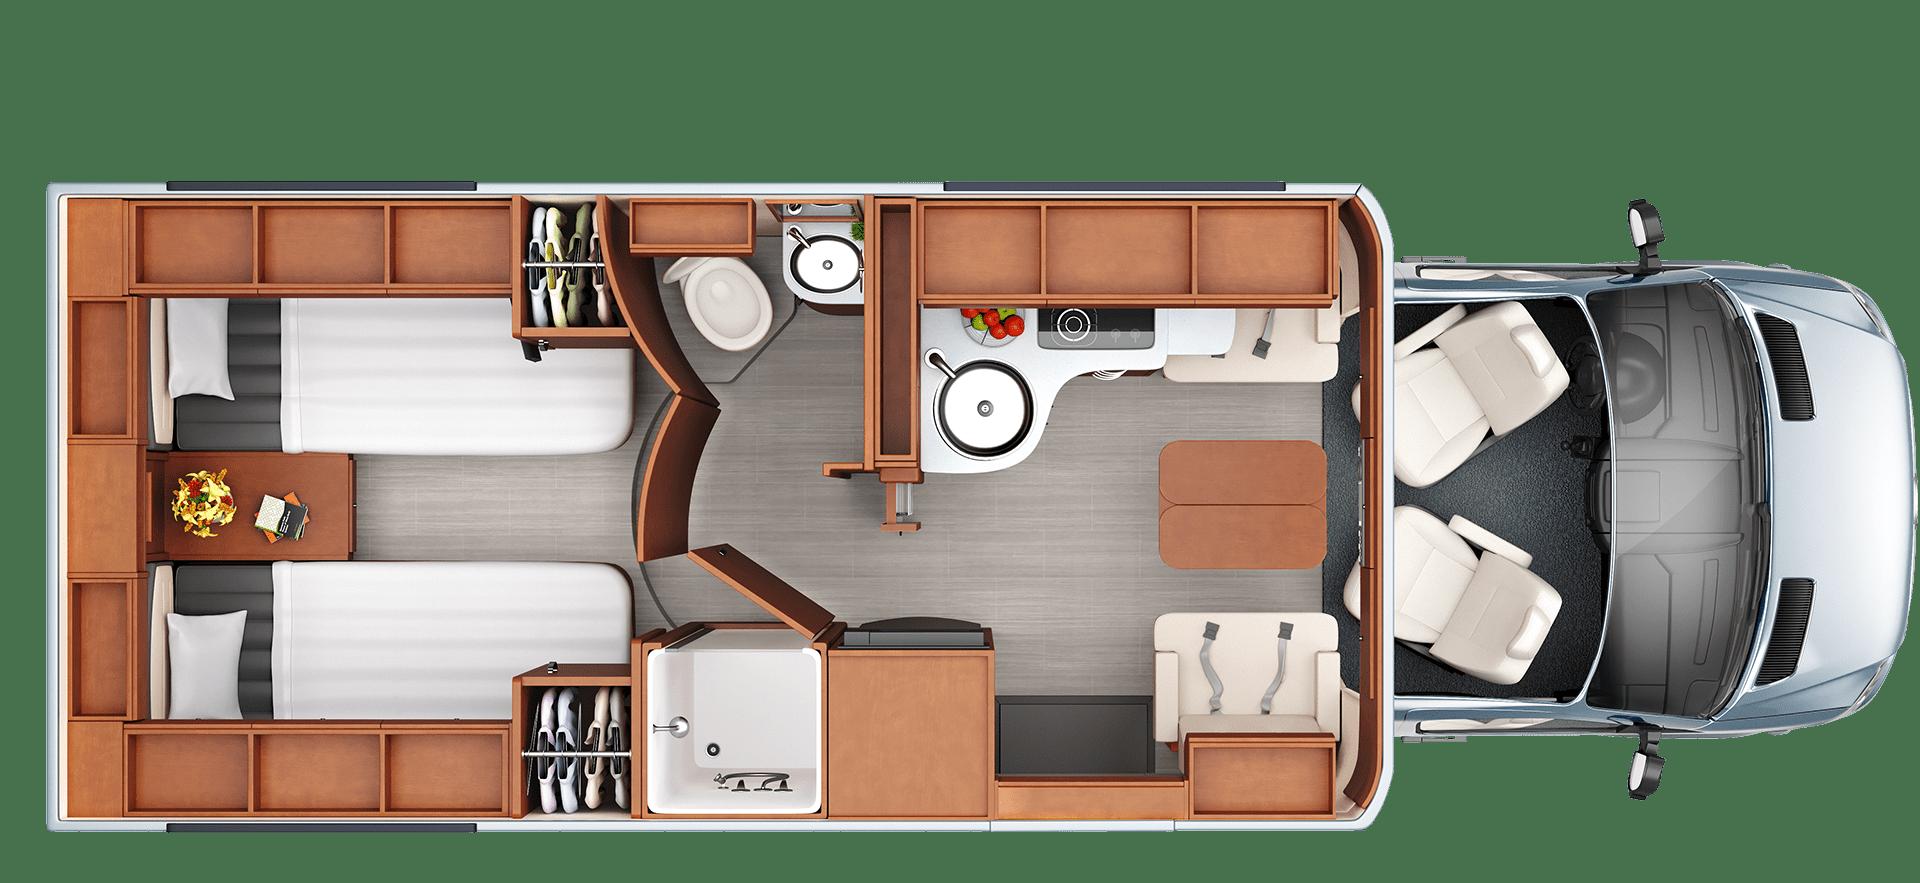 Photo of Unity – Floorplans – Leisure Travel Vans #Floorplans #Leisure #Travel #Unity #va…